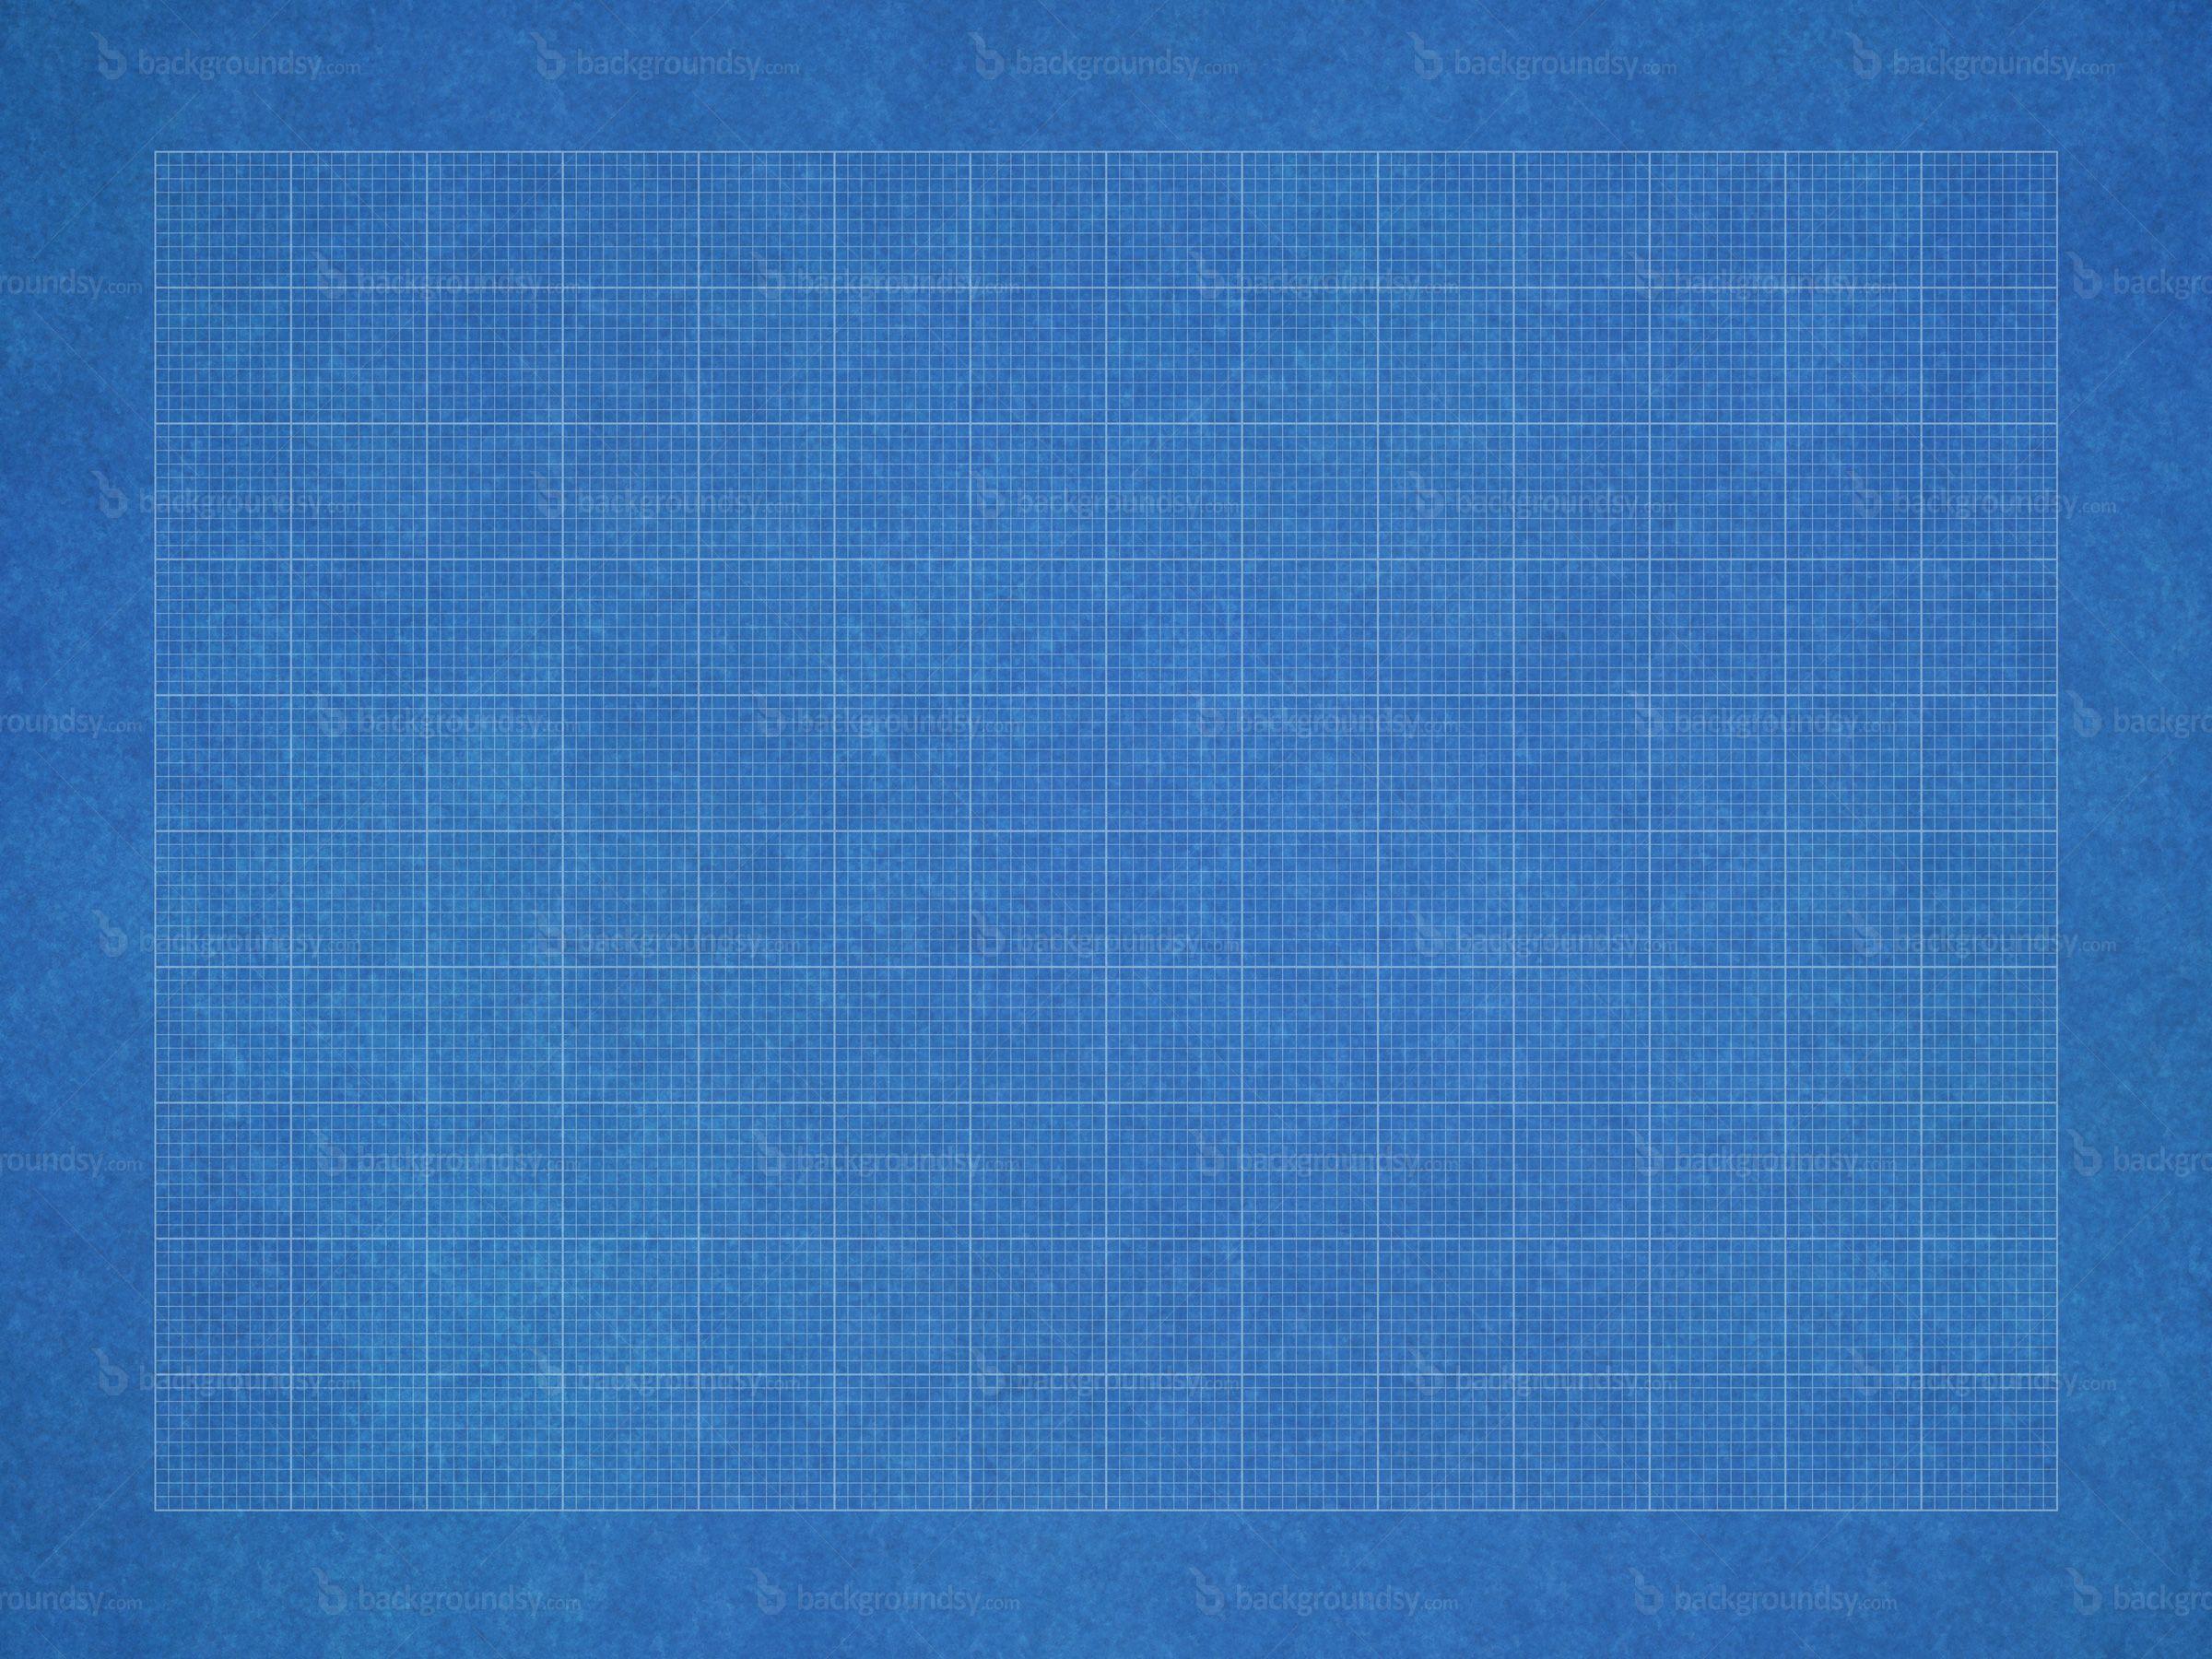 Blueprint graph paper idealstalist blueprint graph paper malvernweather Gallery